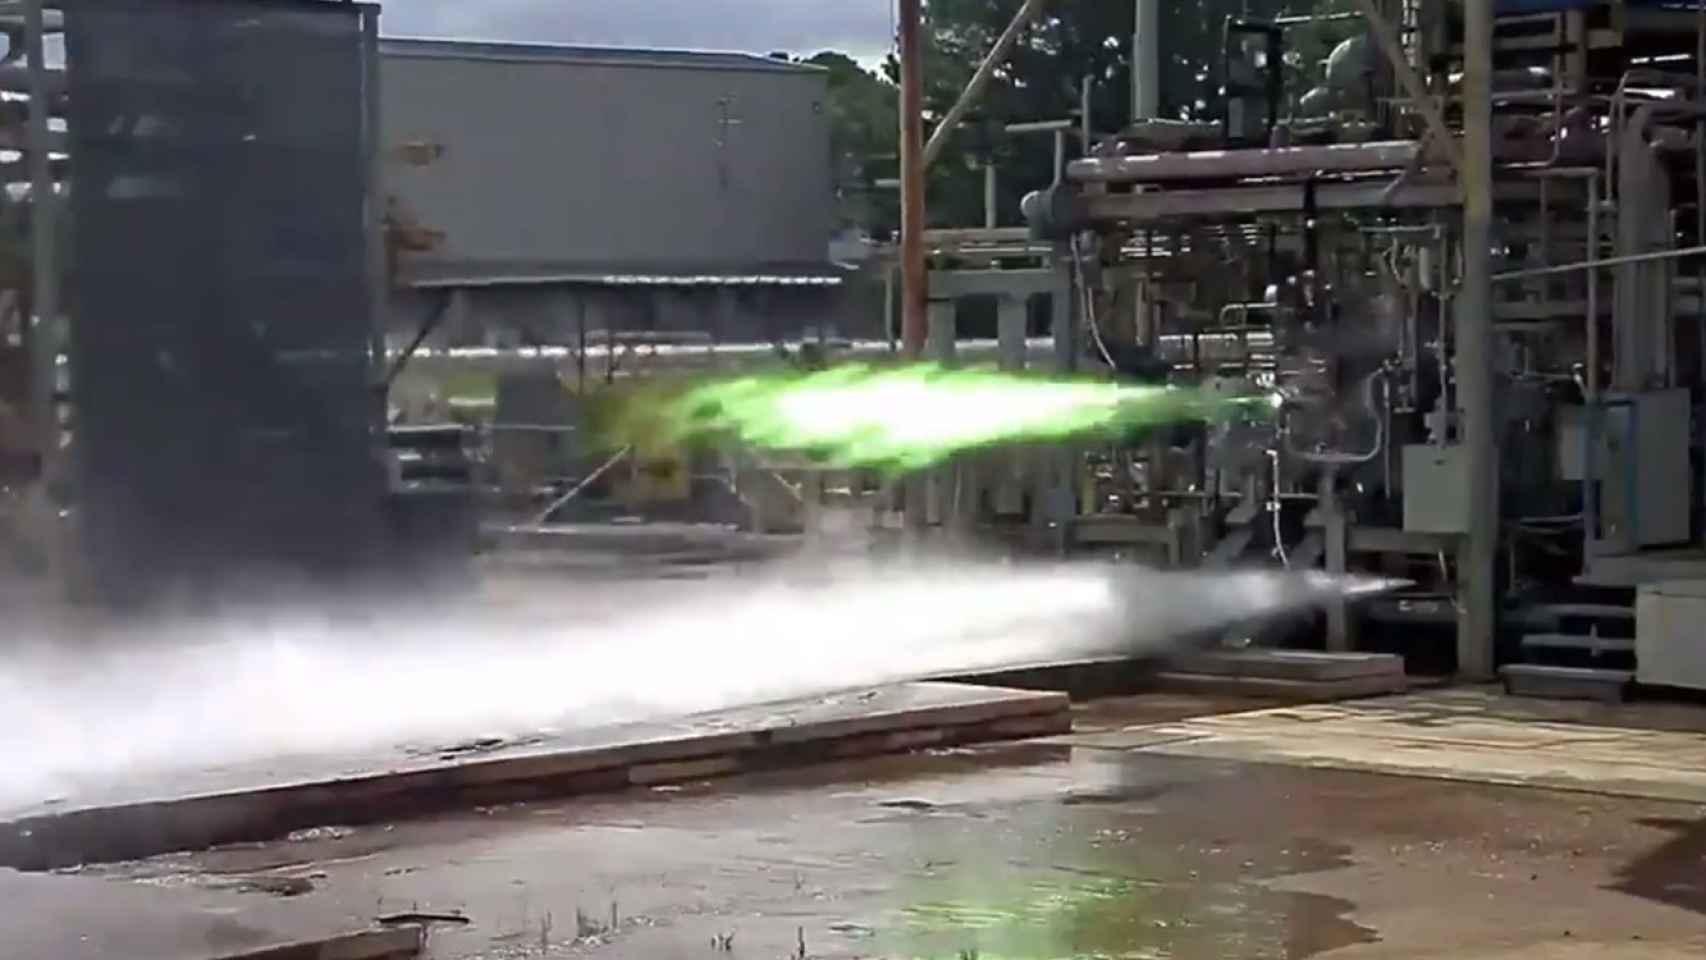 Motor llamas verdes